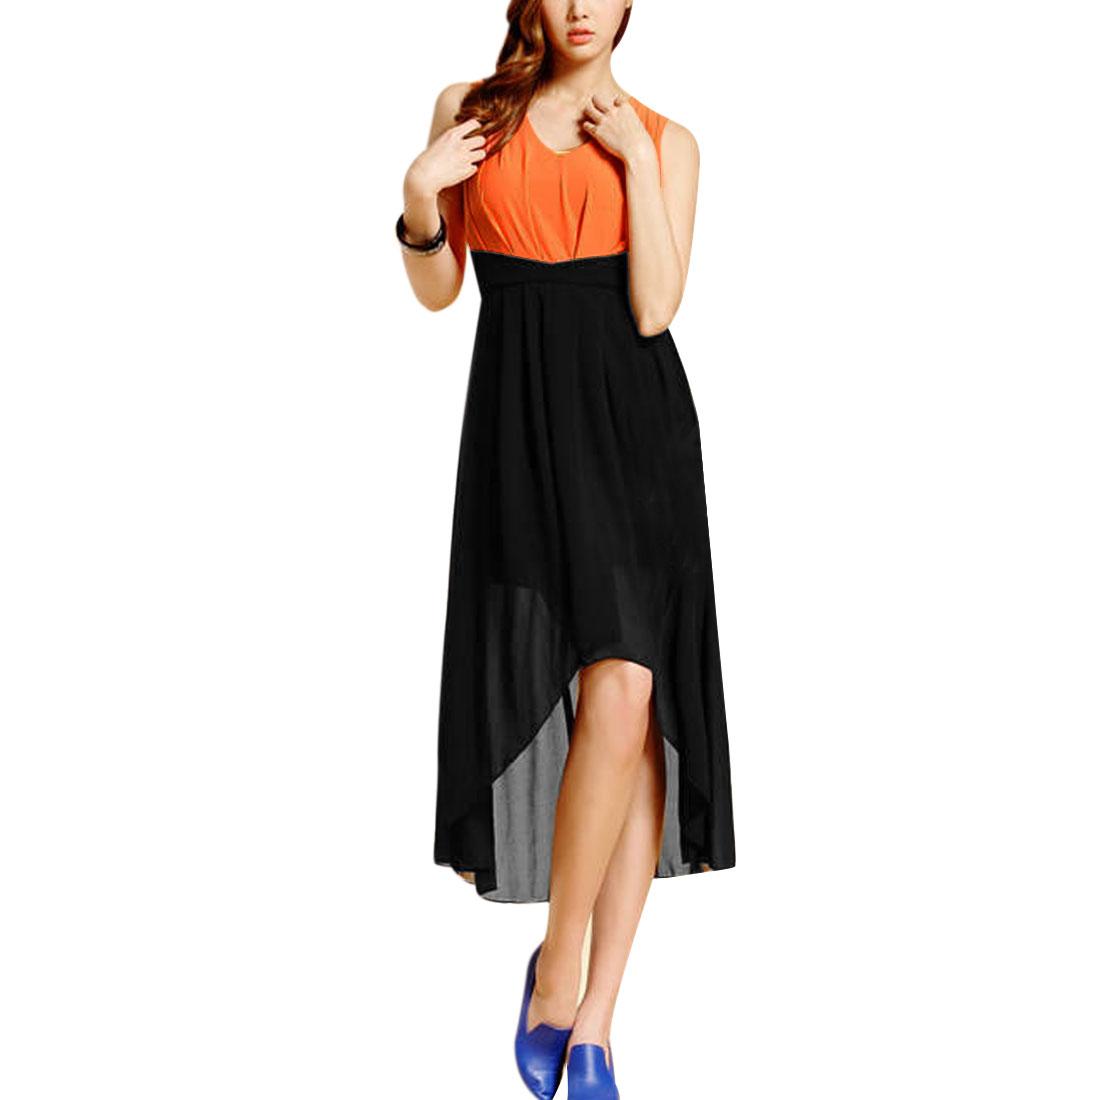 Ladies V Neck Panel Casual Dress Orange Black XS